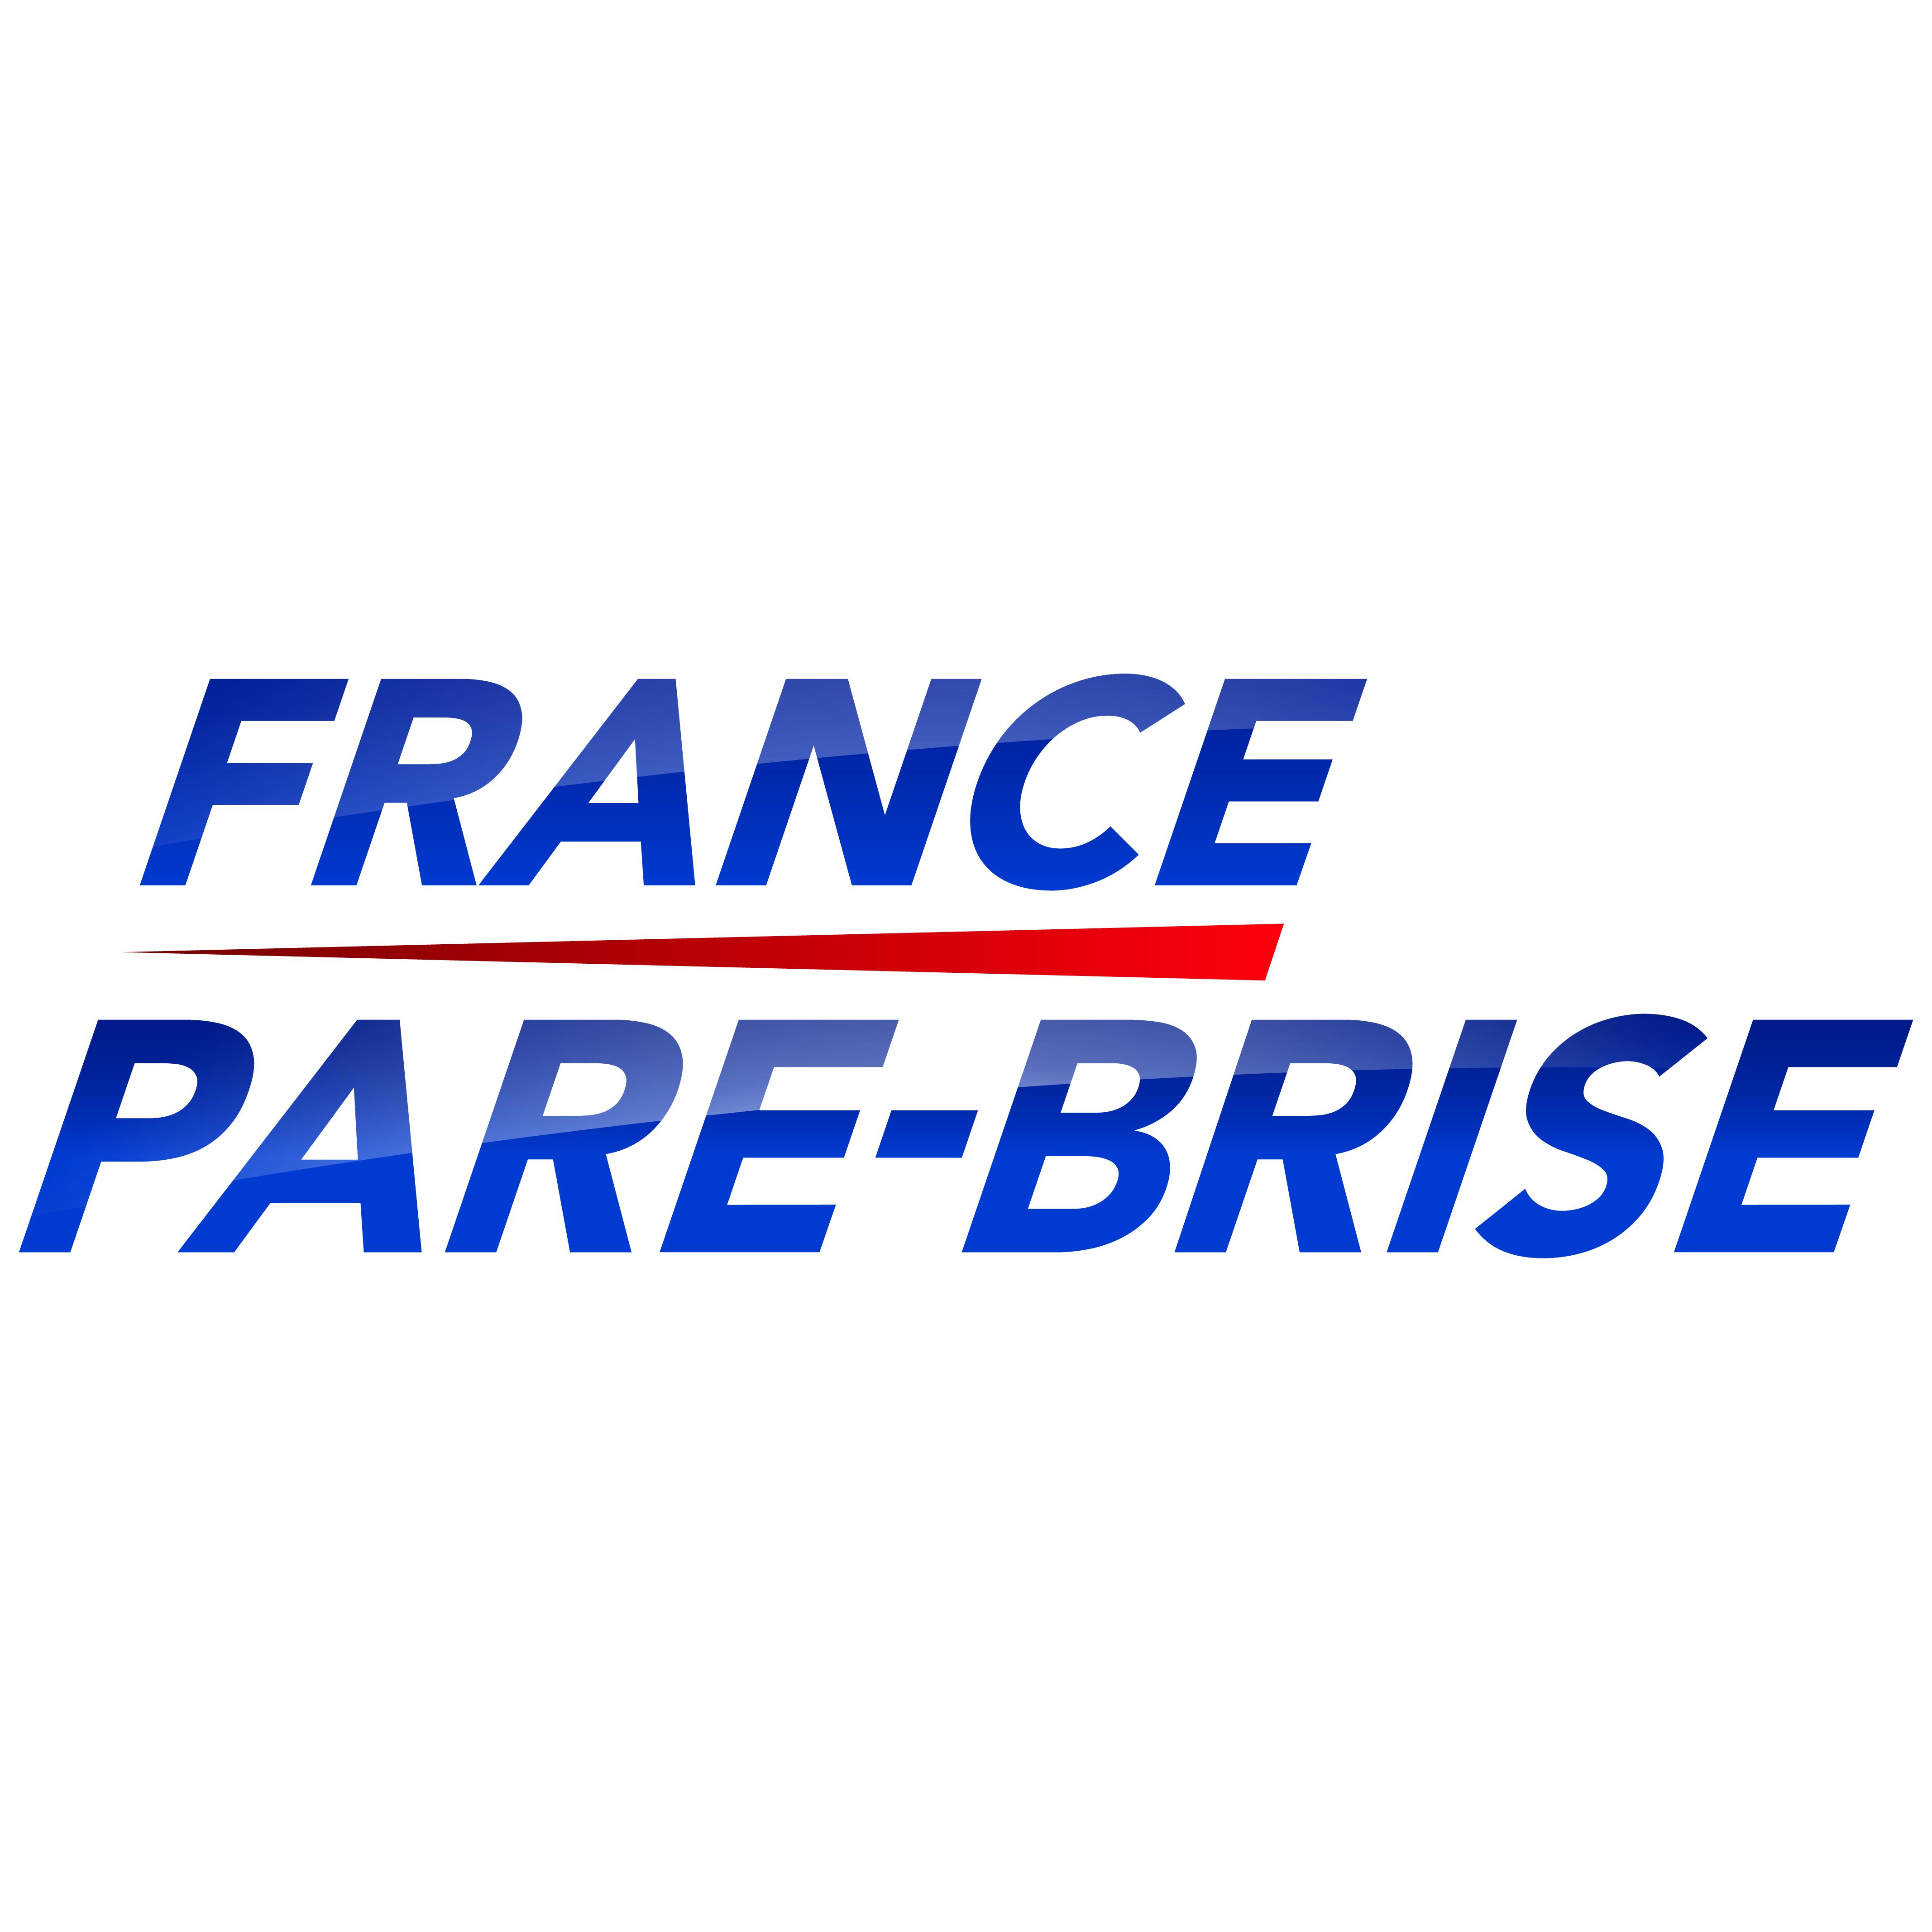 France Pare-Brise LIMOGES vitrerie (pose), vitrier